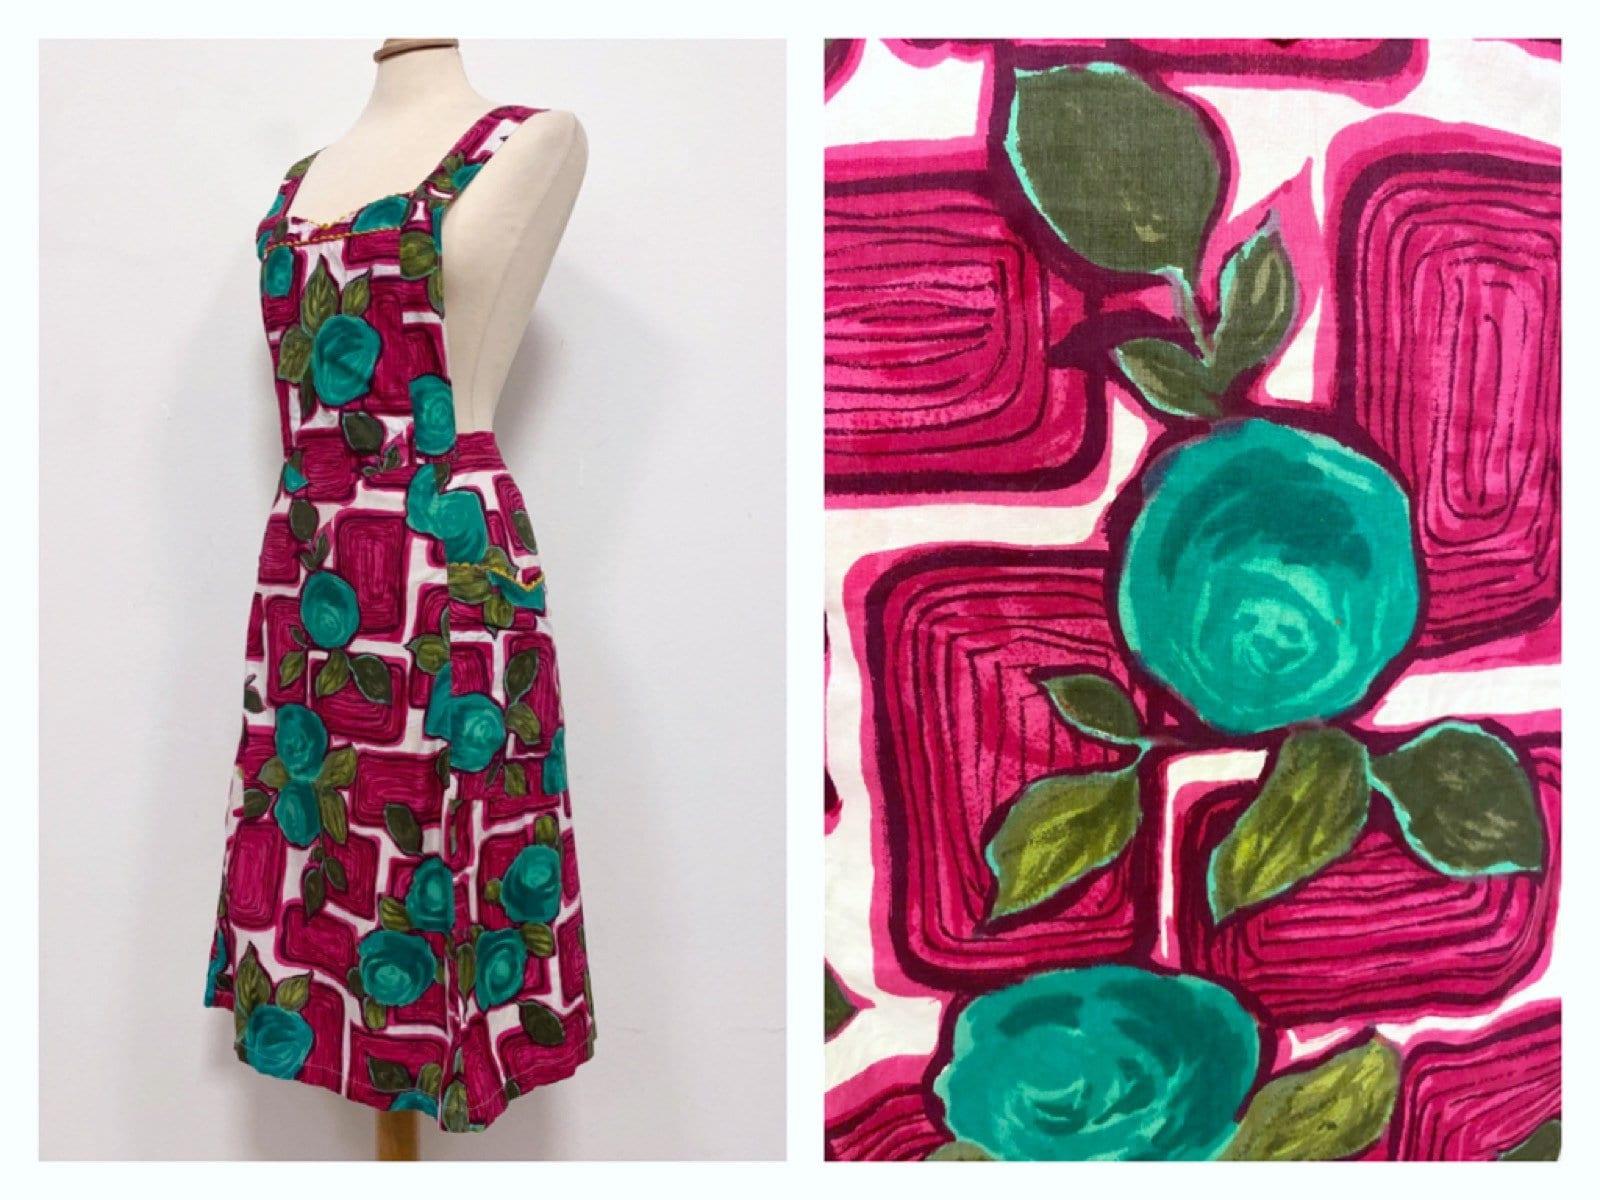 Vintage Aprons, Retro Aprons, Old Fashioned Aprons & Patterns Vintage 1950S 1960S Abstract Graphic Floral Print Cotton ApronPinafore Dress - Size M $75.20 AT vintagedancer.com